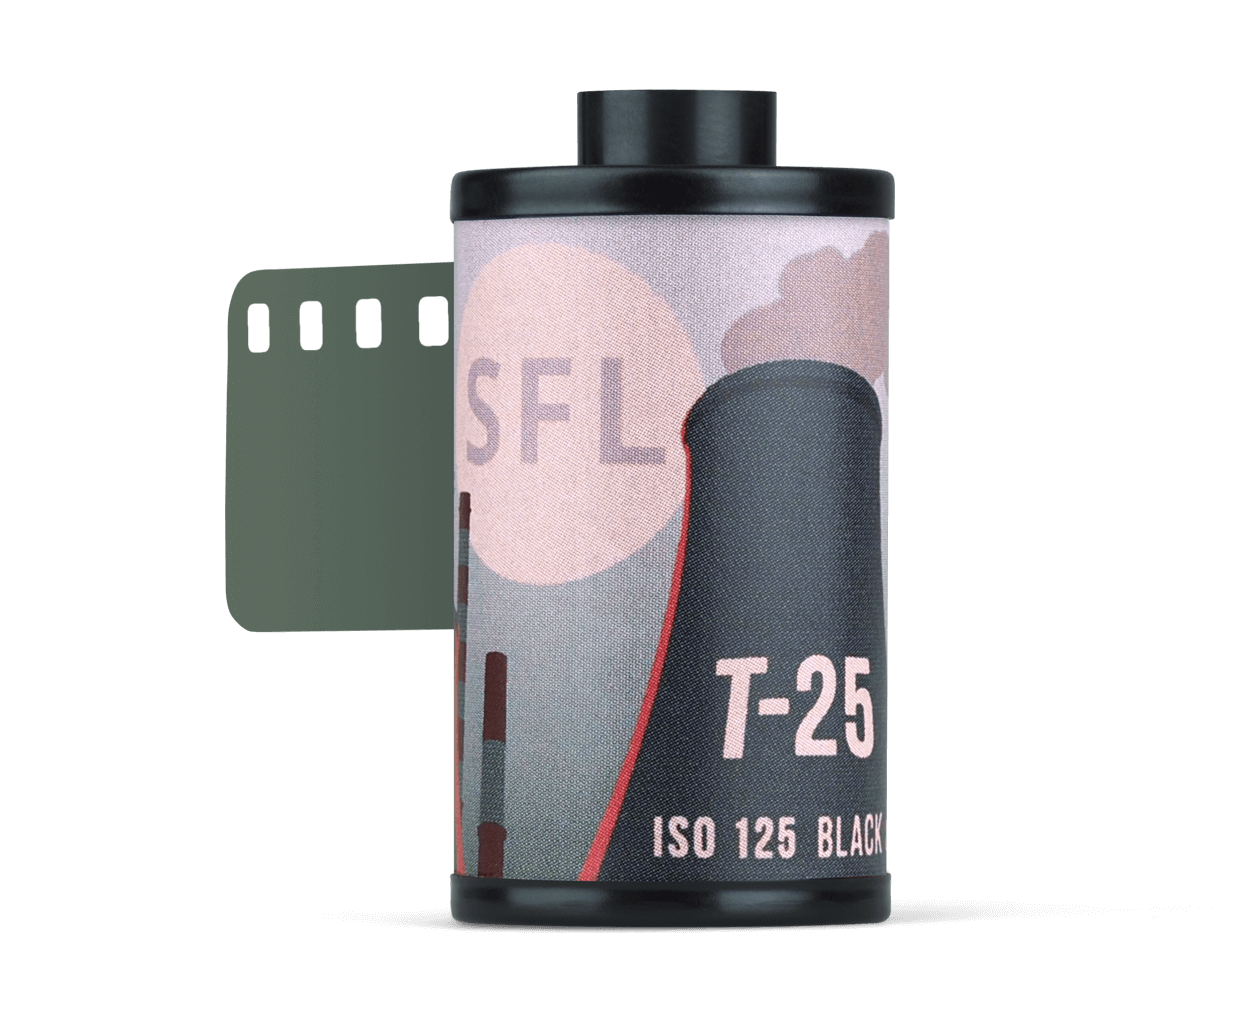 Sreda Film Lab - Tasma T-25 format 135-36 black and white film expired 12/2022